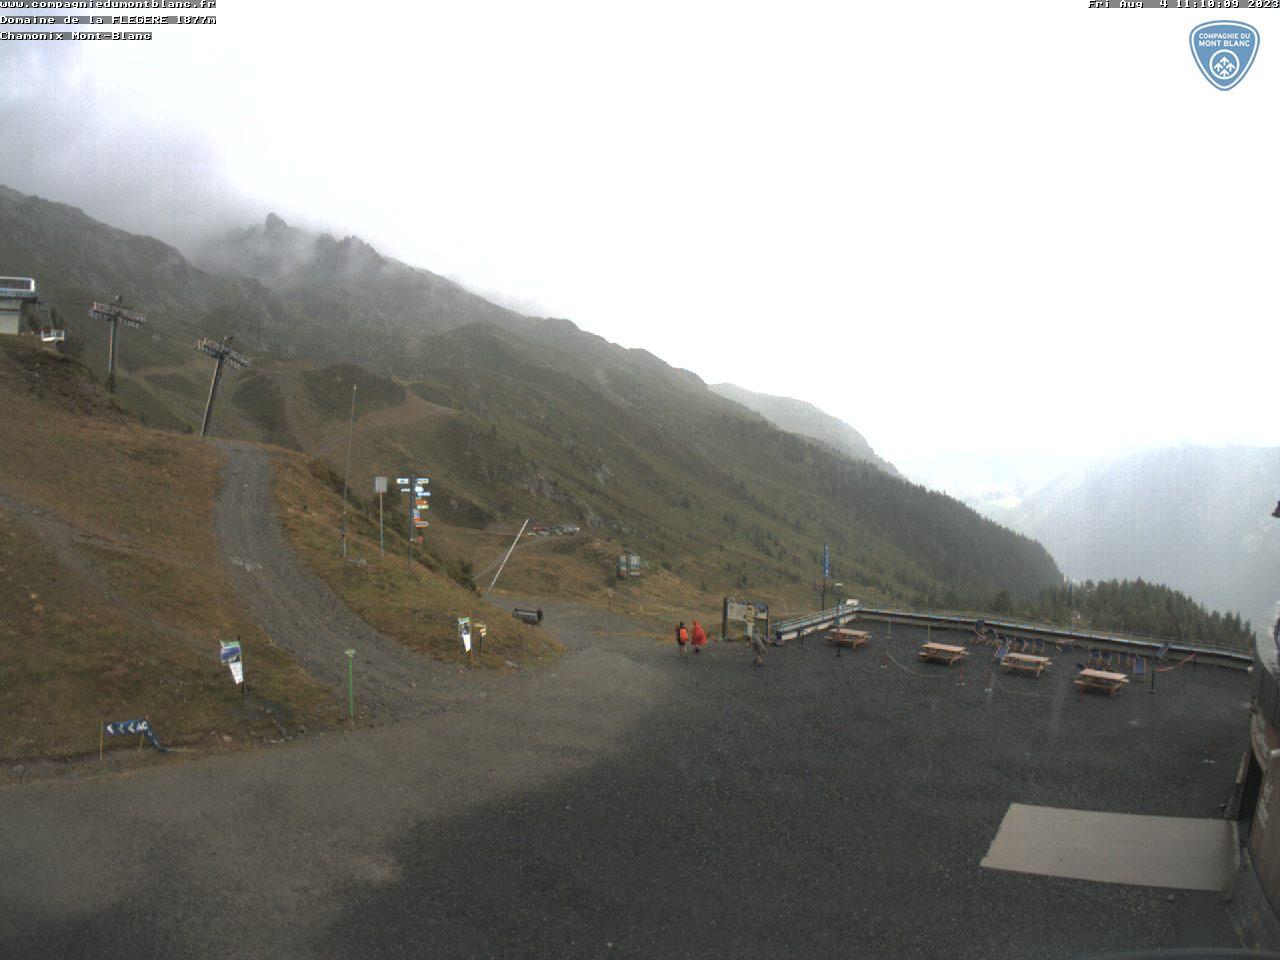 Chamonix Flegere area webcam - ski station